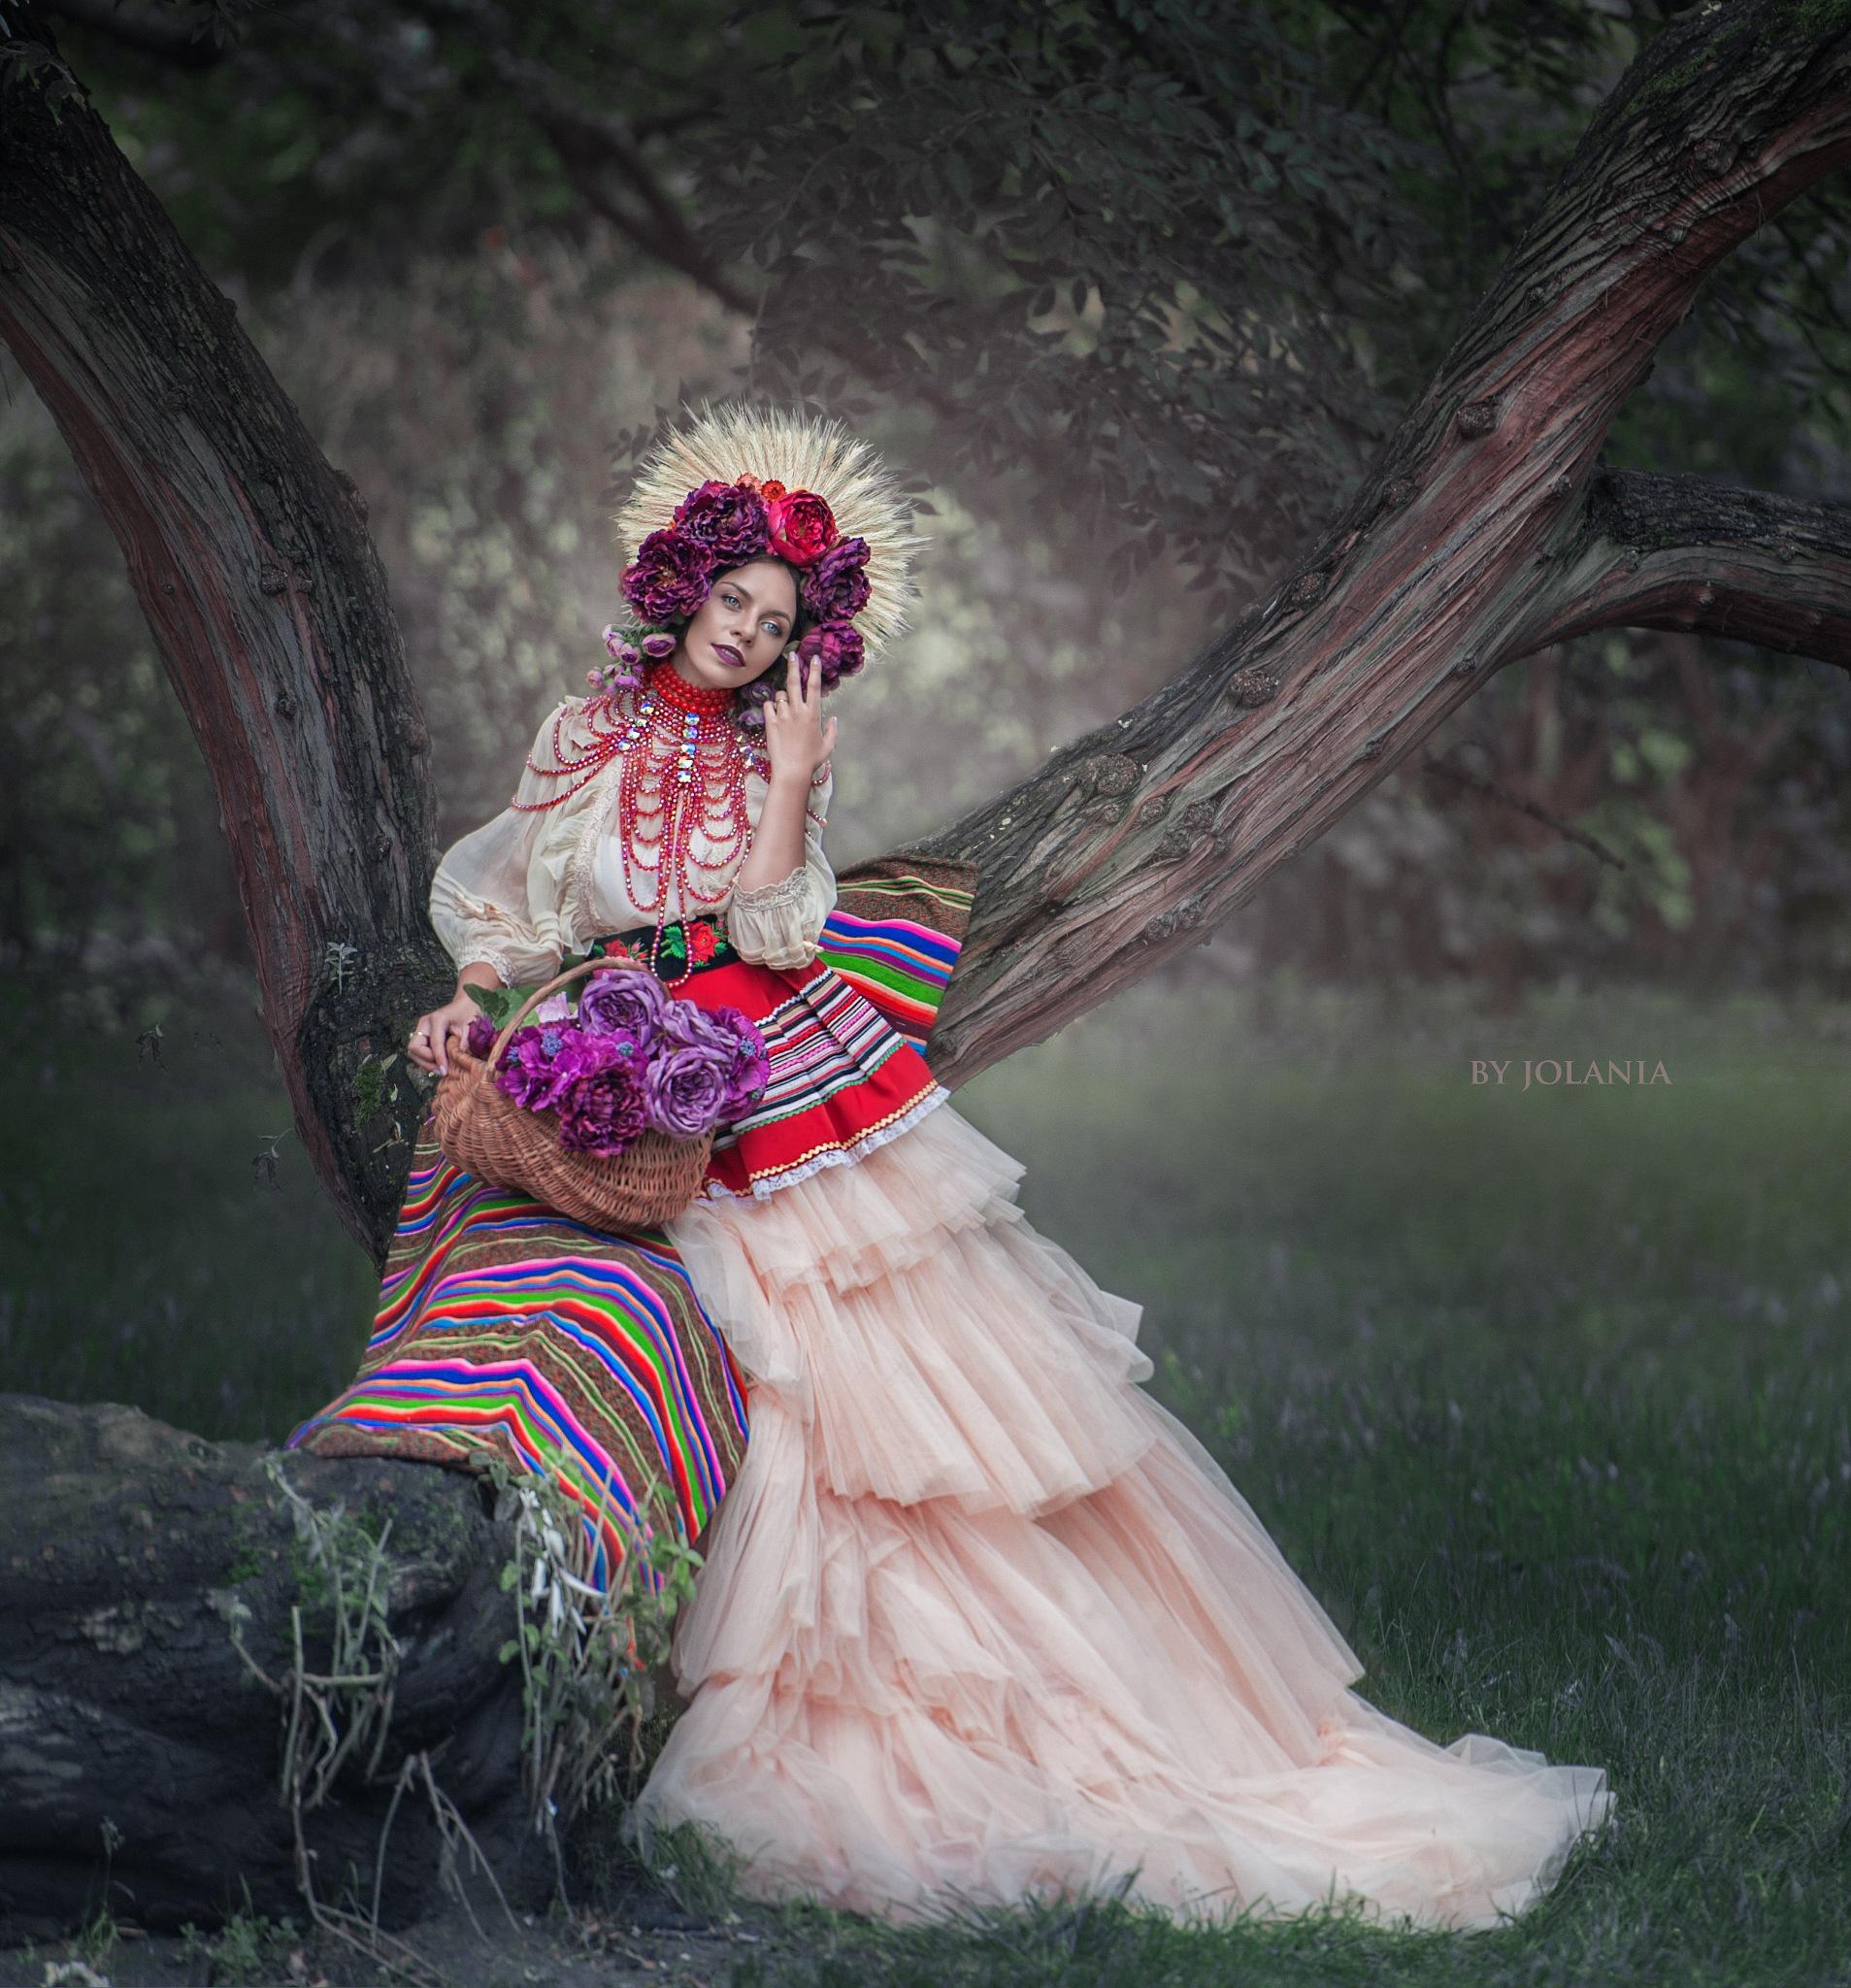 Polish Girl by Jolania